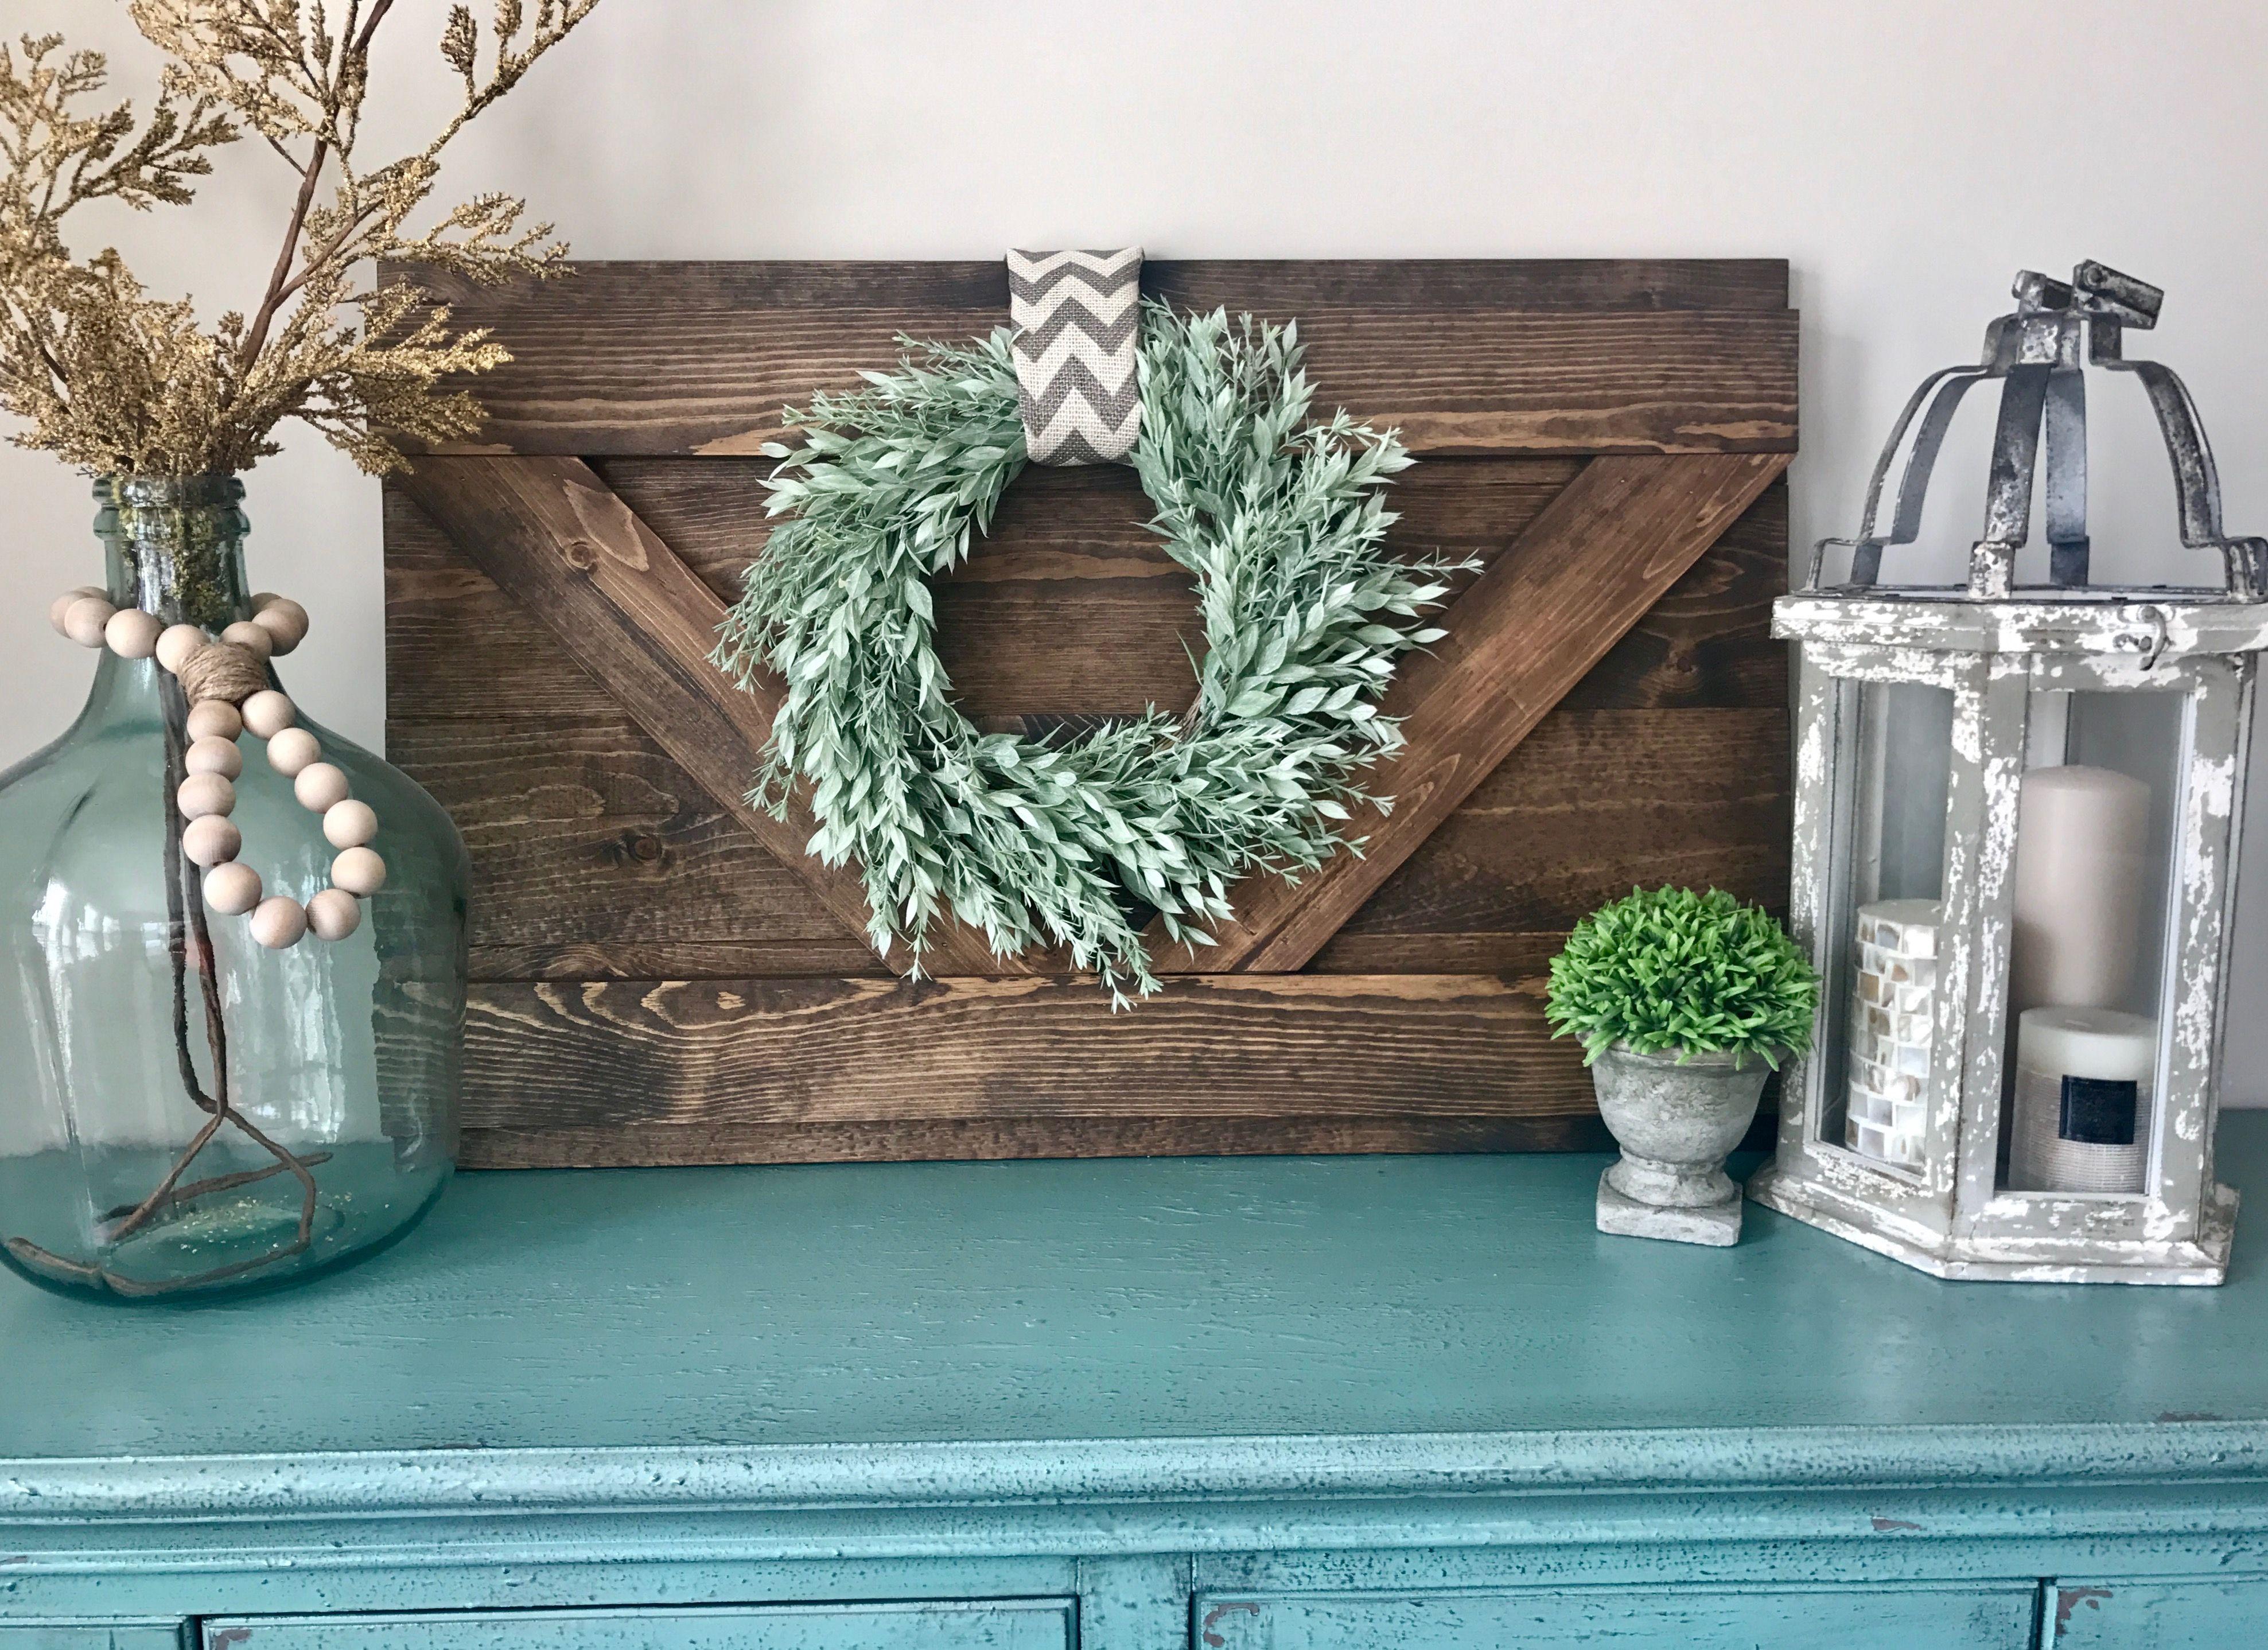 Extra Large Decorative Wood Shutter Rustic Wall Decor Farmhouse Barn Door Style Interior Wreath Holder